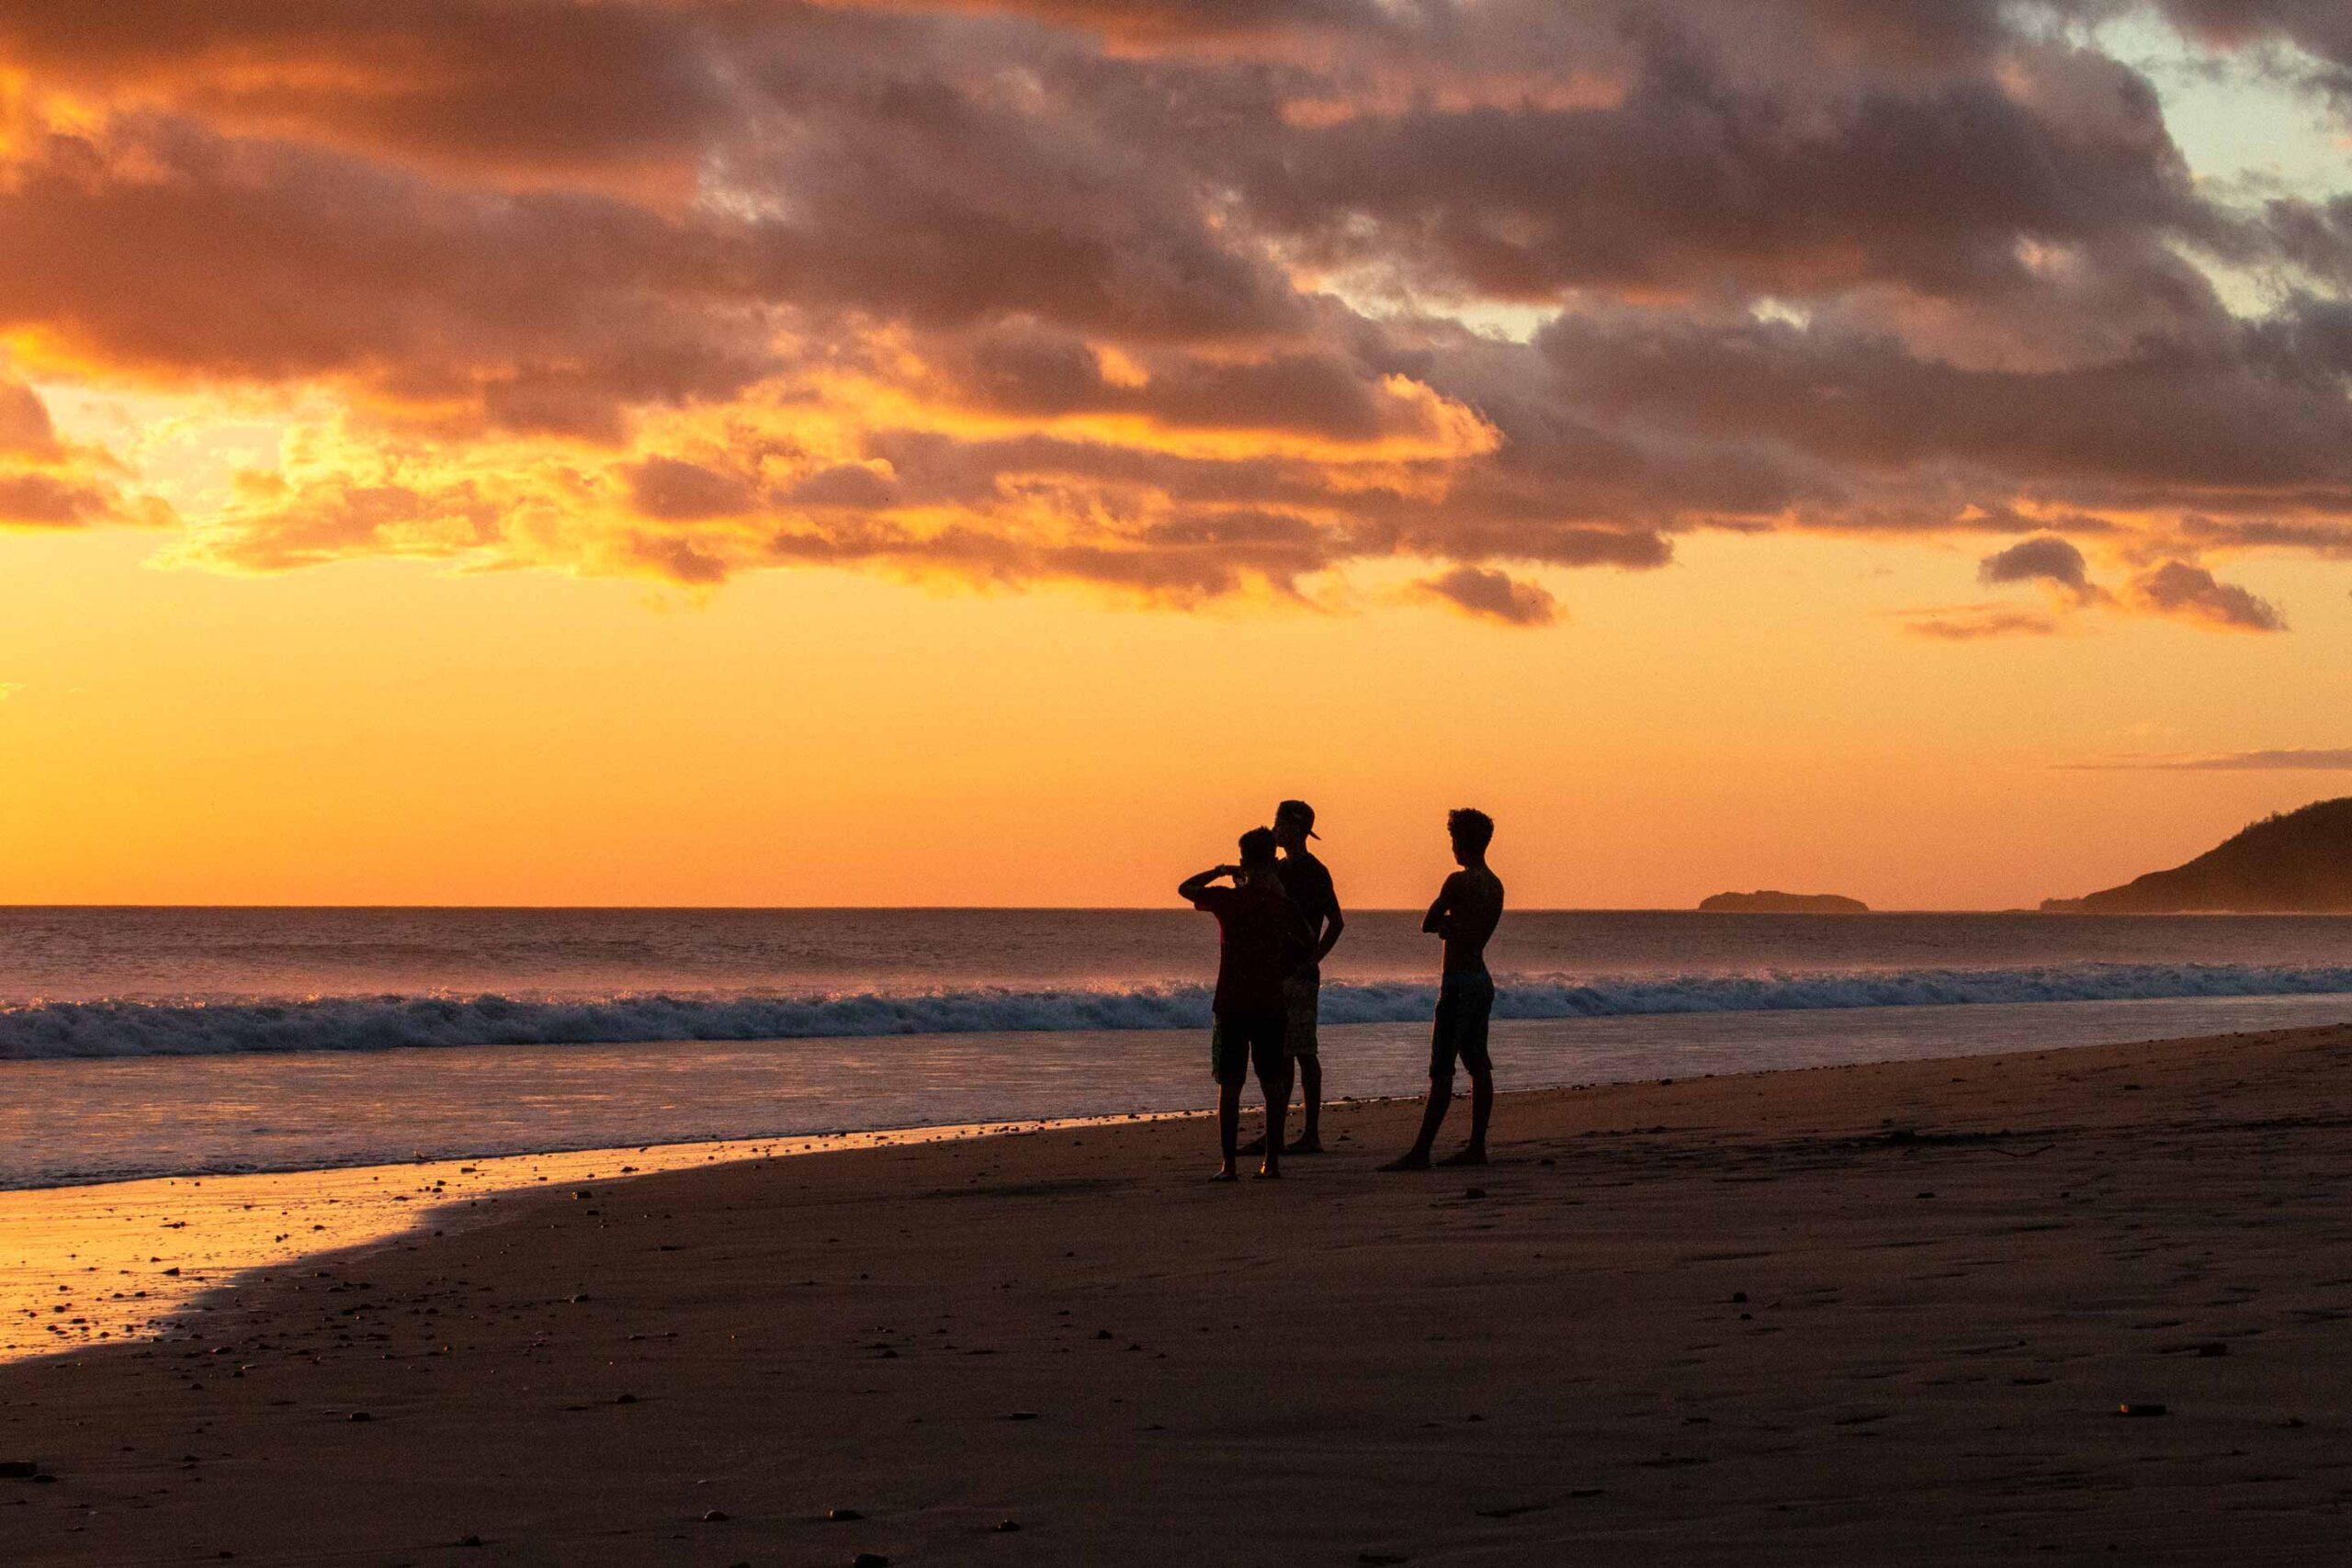 Sunset surf check at Playa Guasacate Nicaragua